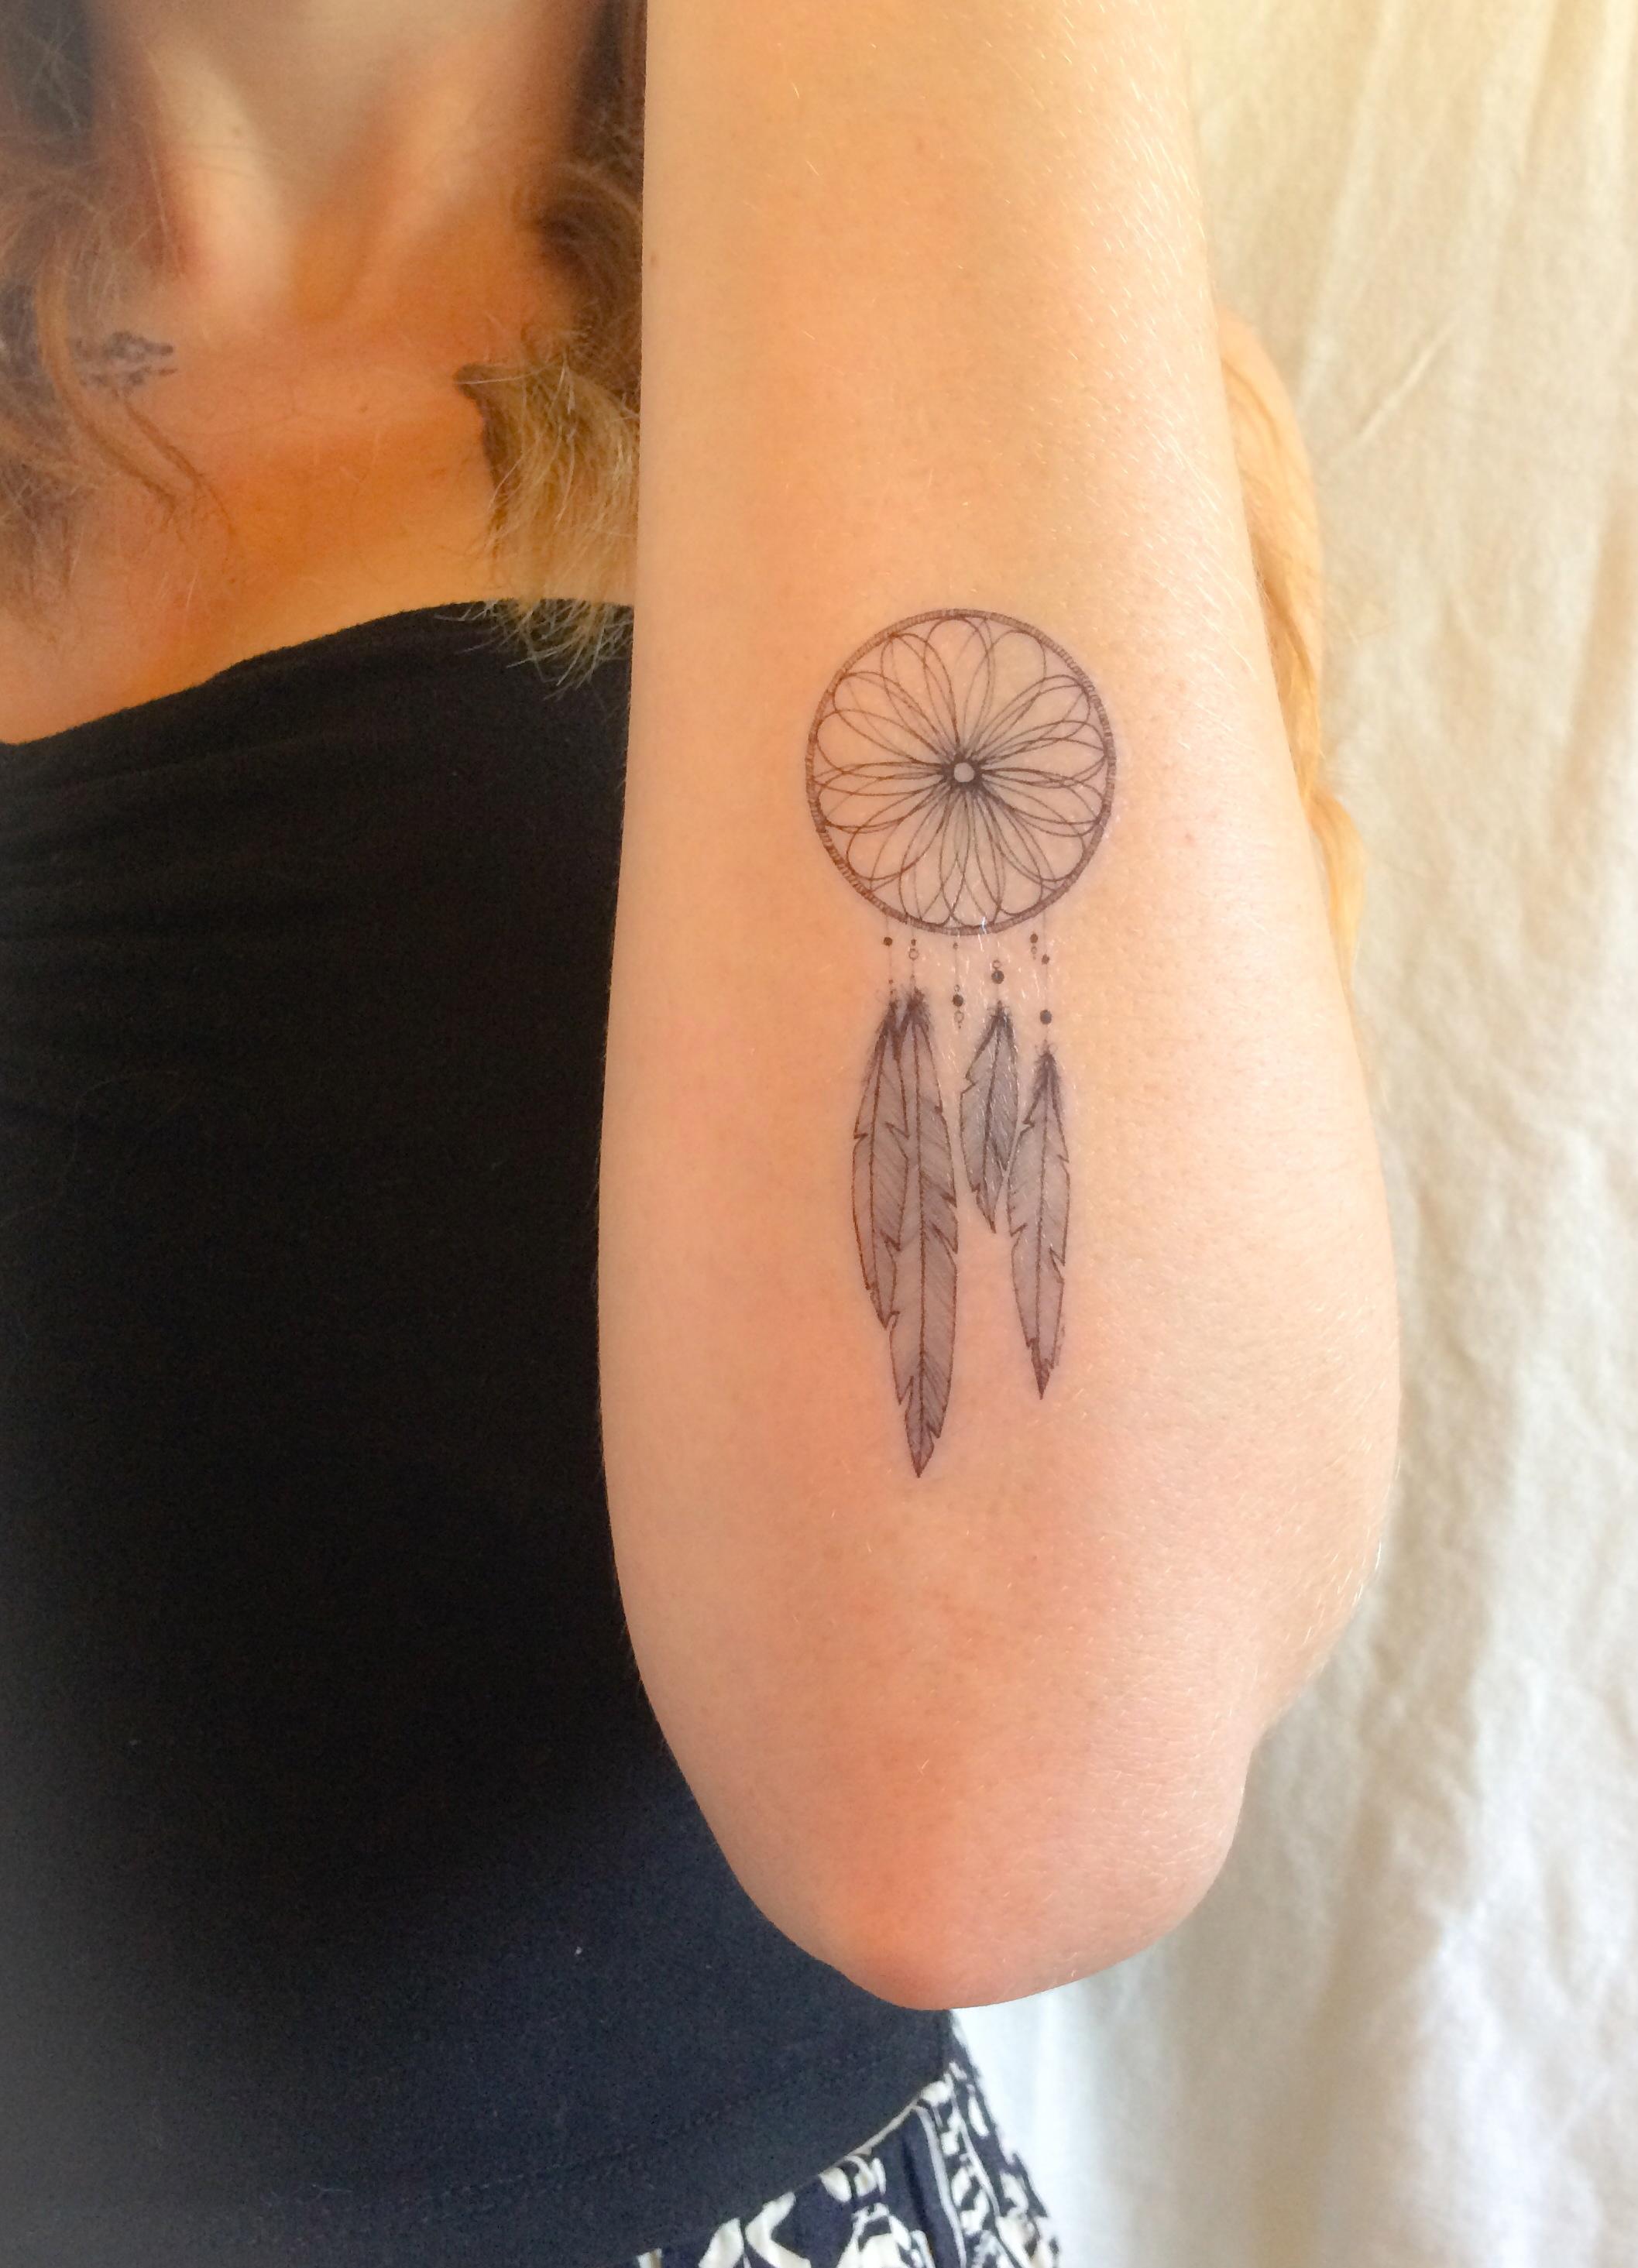 Real Looking Sitting Rabbit Tattoo On Forearm photo - 1